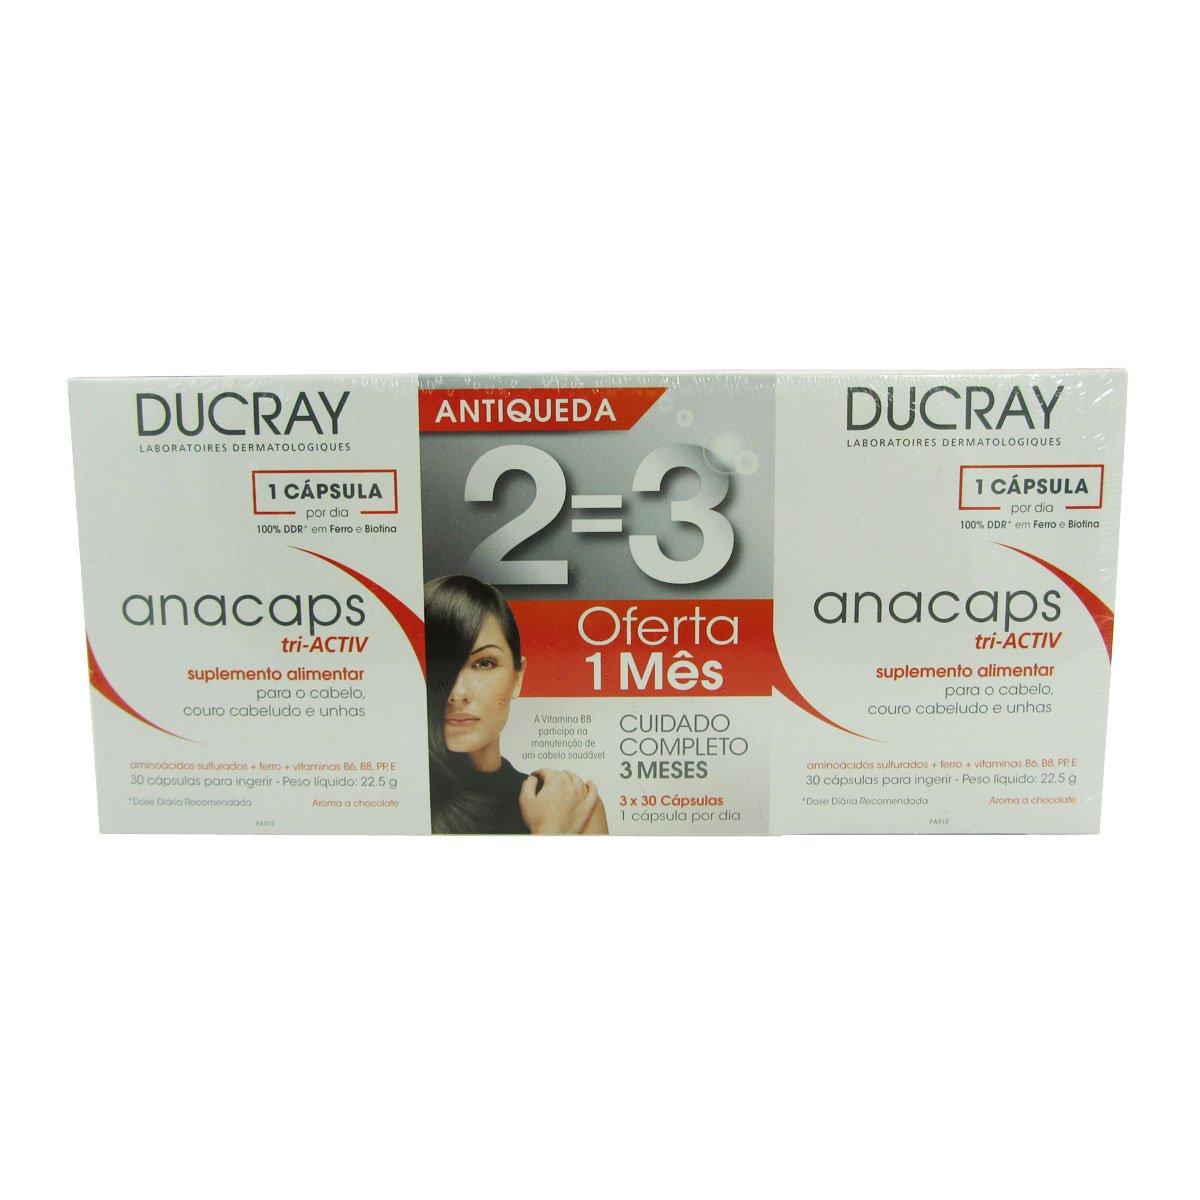 Ducray Anacaps Reactiv Pack 3 X30 Caps